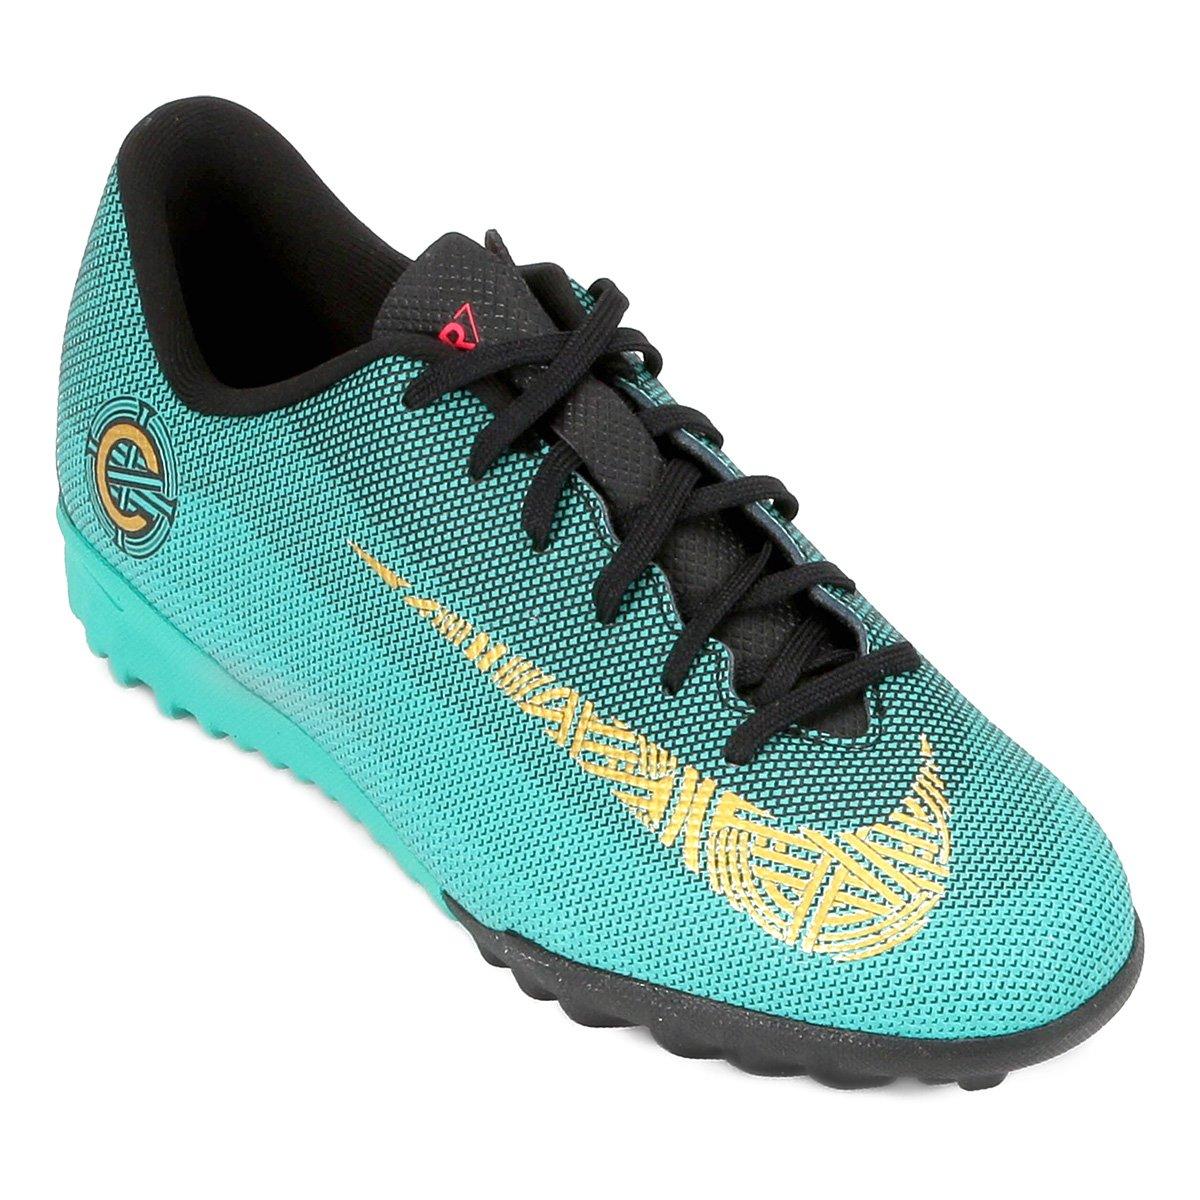 4ee7fd57be Chuteira Society Infantil Nike Mercurial Vapor 12 Academy GS CR7 TF ...